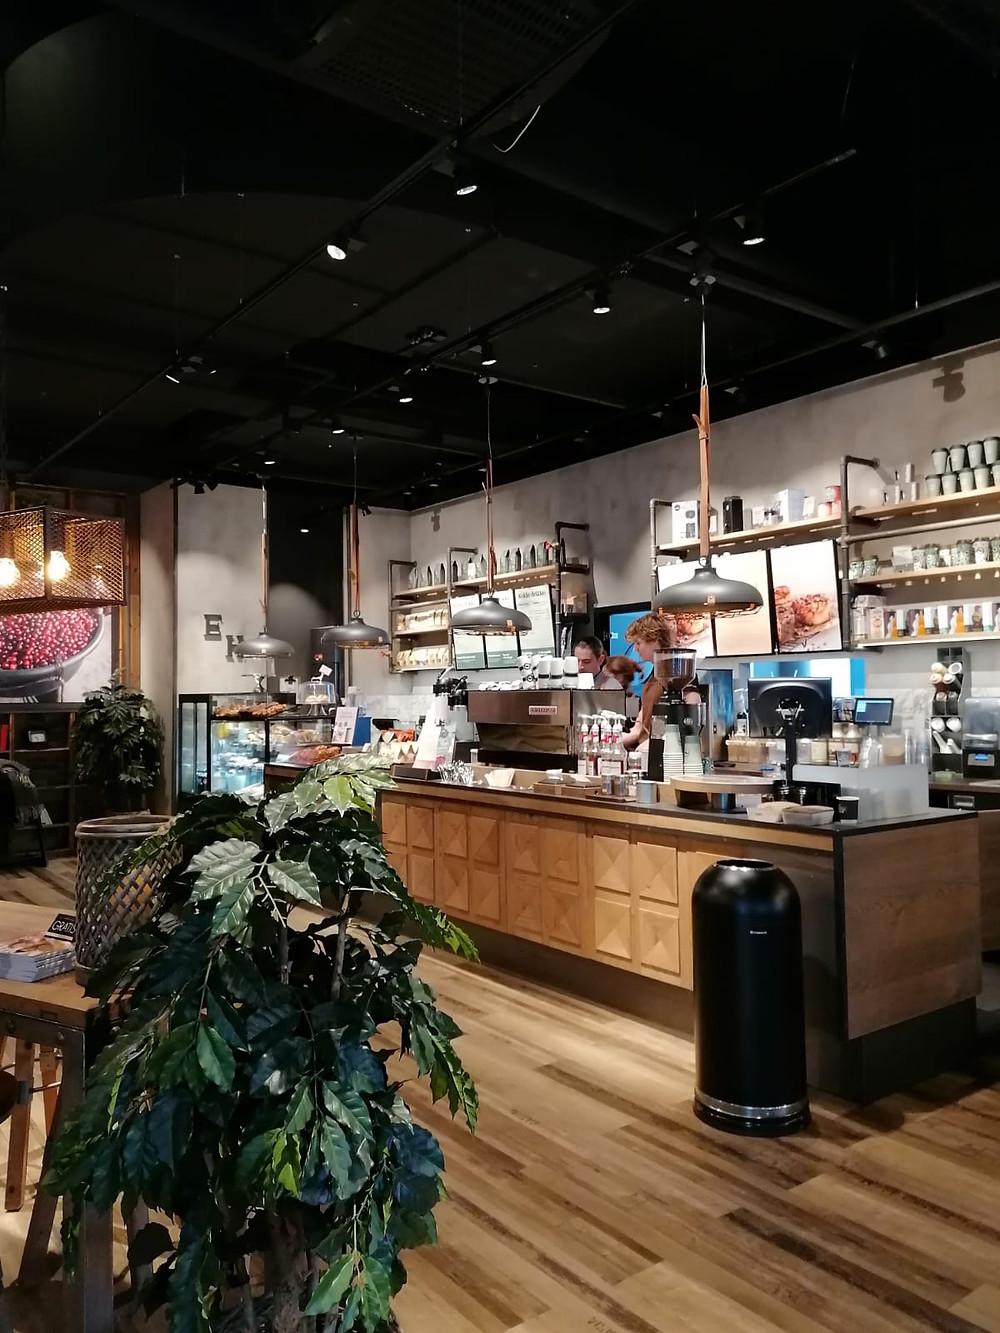 Españoles Dinamarca Networking Café Cafetería Bares Hostelería